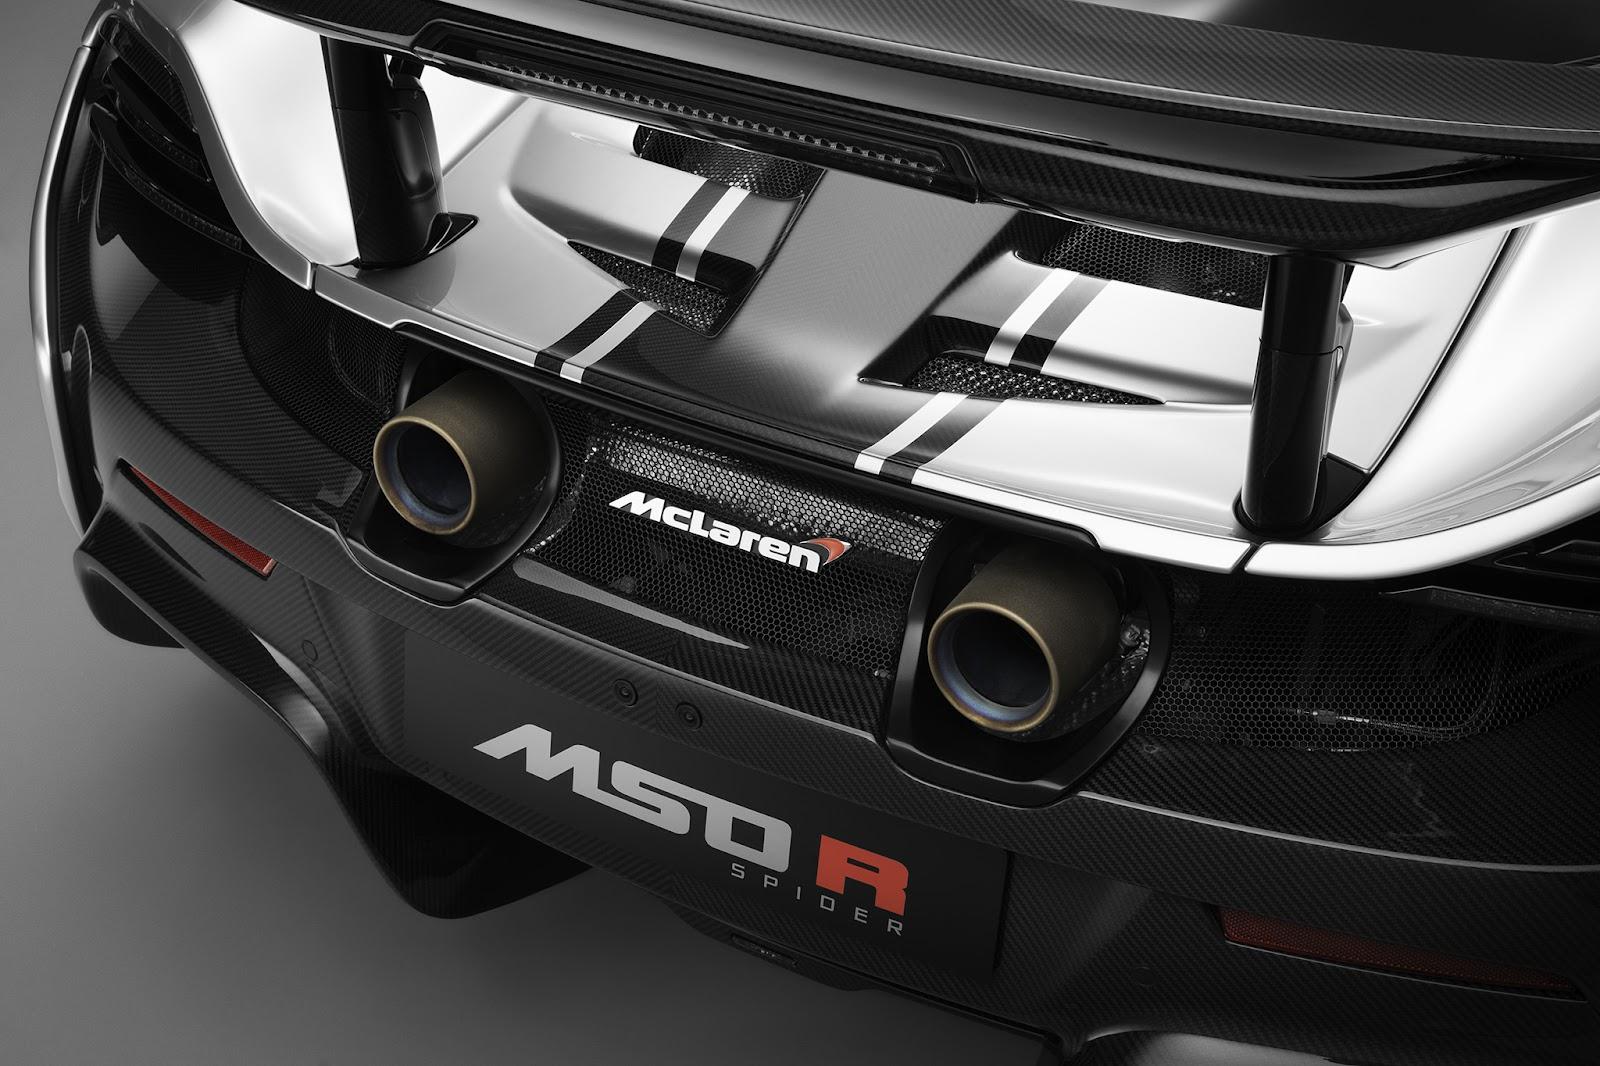 McLaren-MSO-R-Twins-Rear.jpg